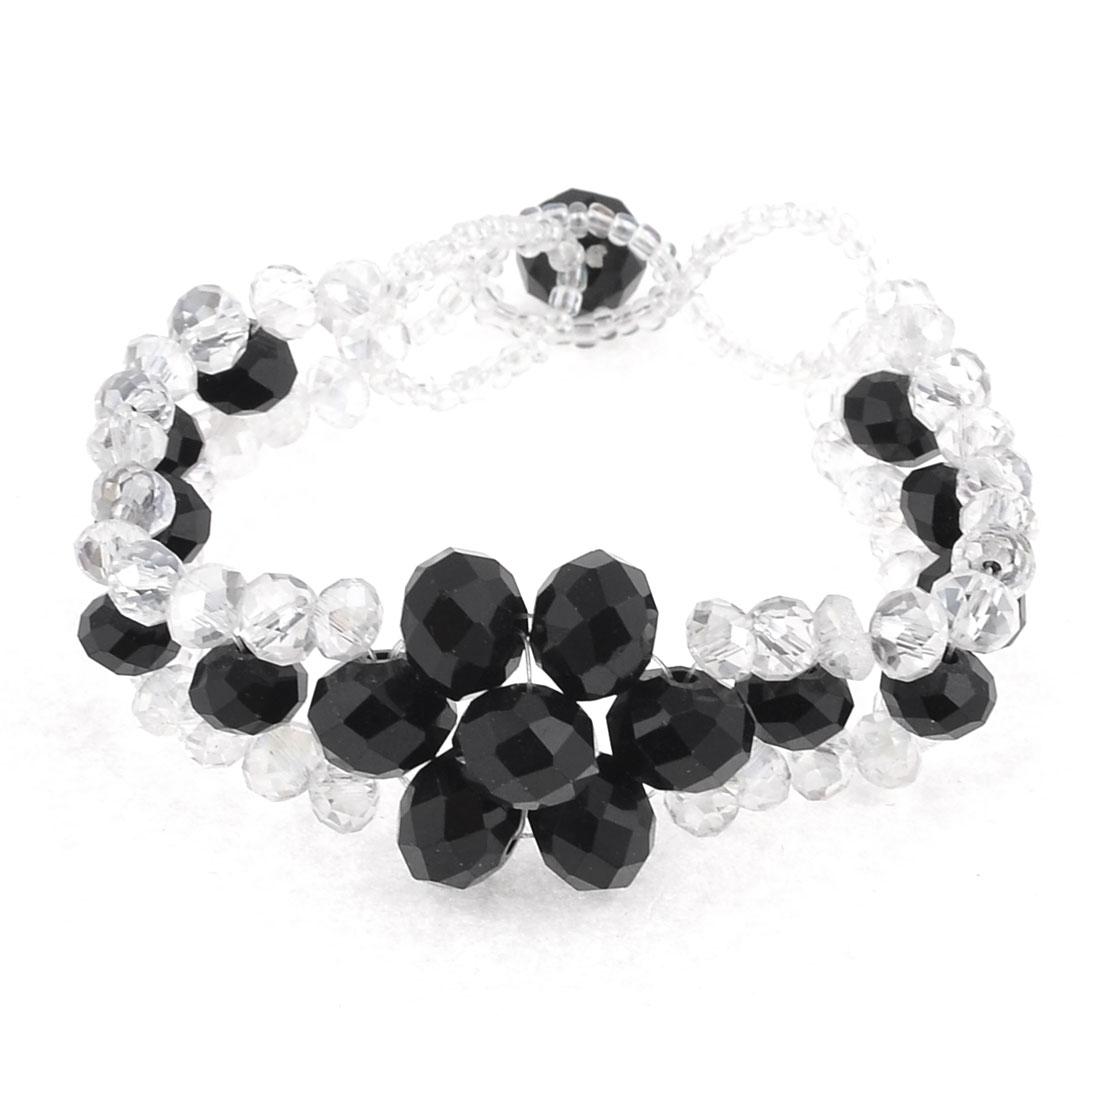 "6.3"" Girth Lady Wrist Ornamet Black Clear Handmade Bracelet"